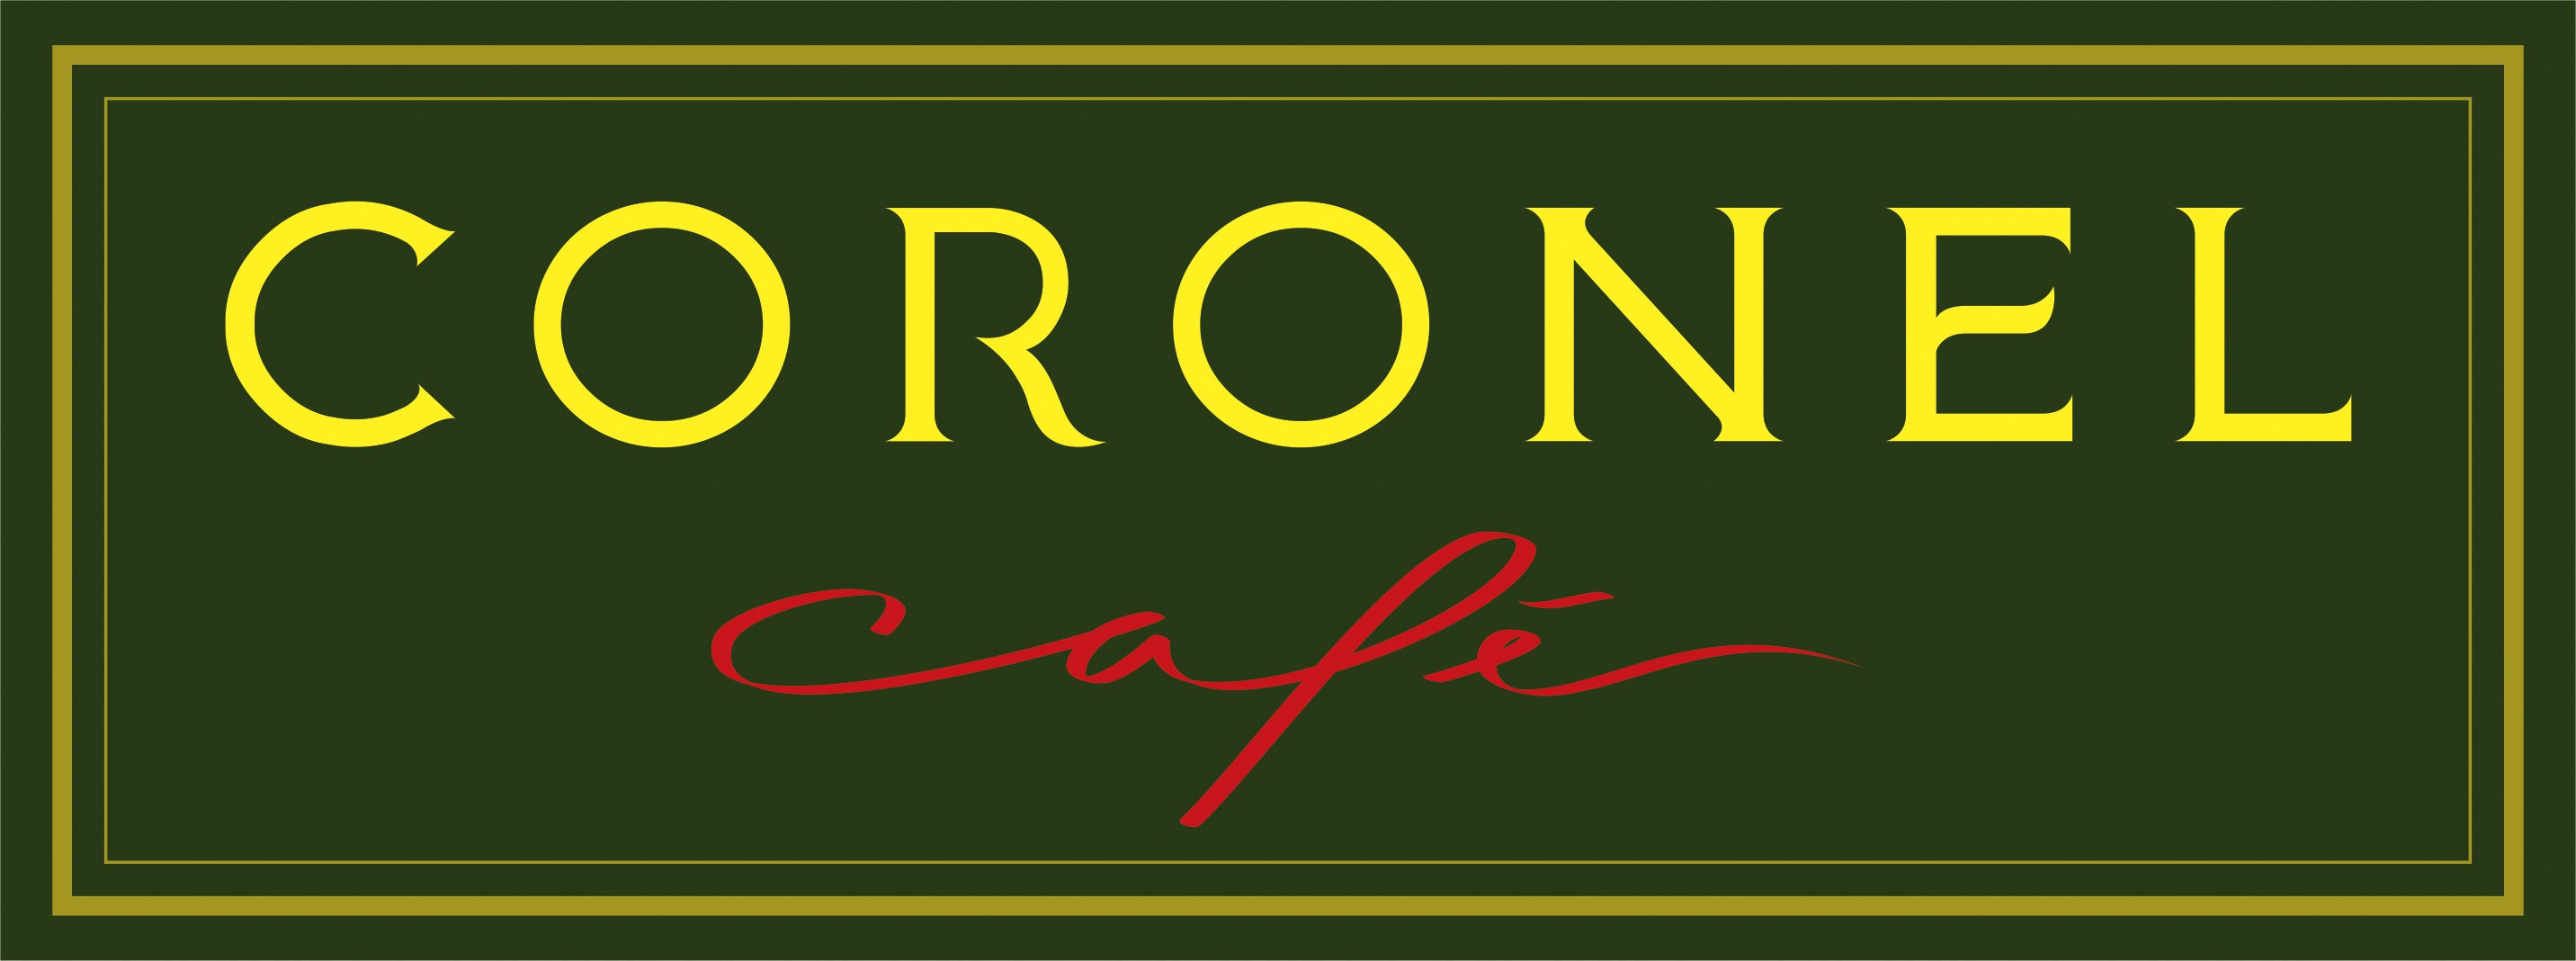 CORONEL CAFÉ ORGANICO